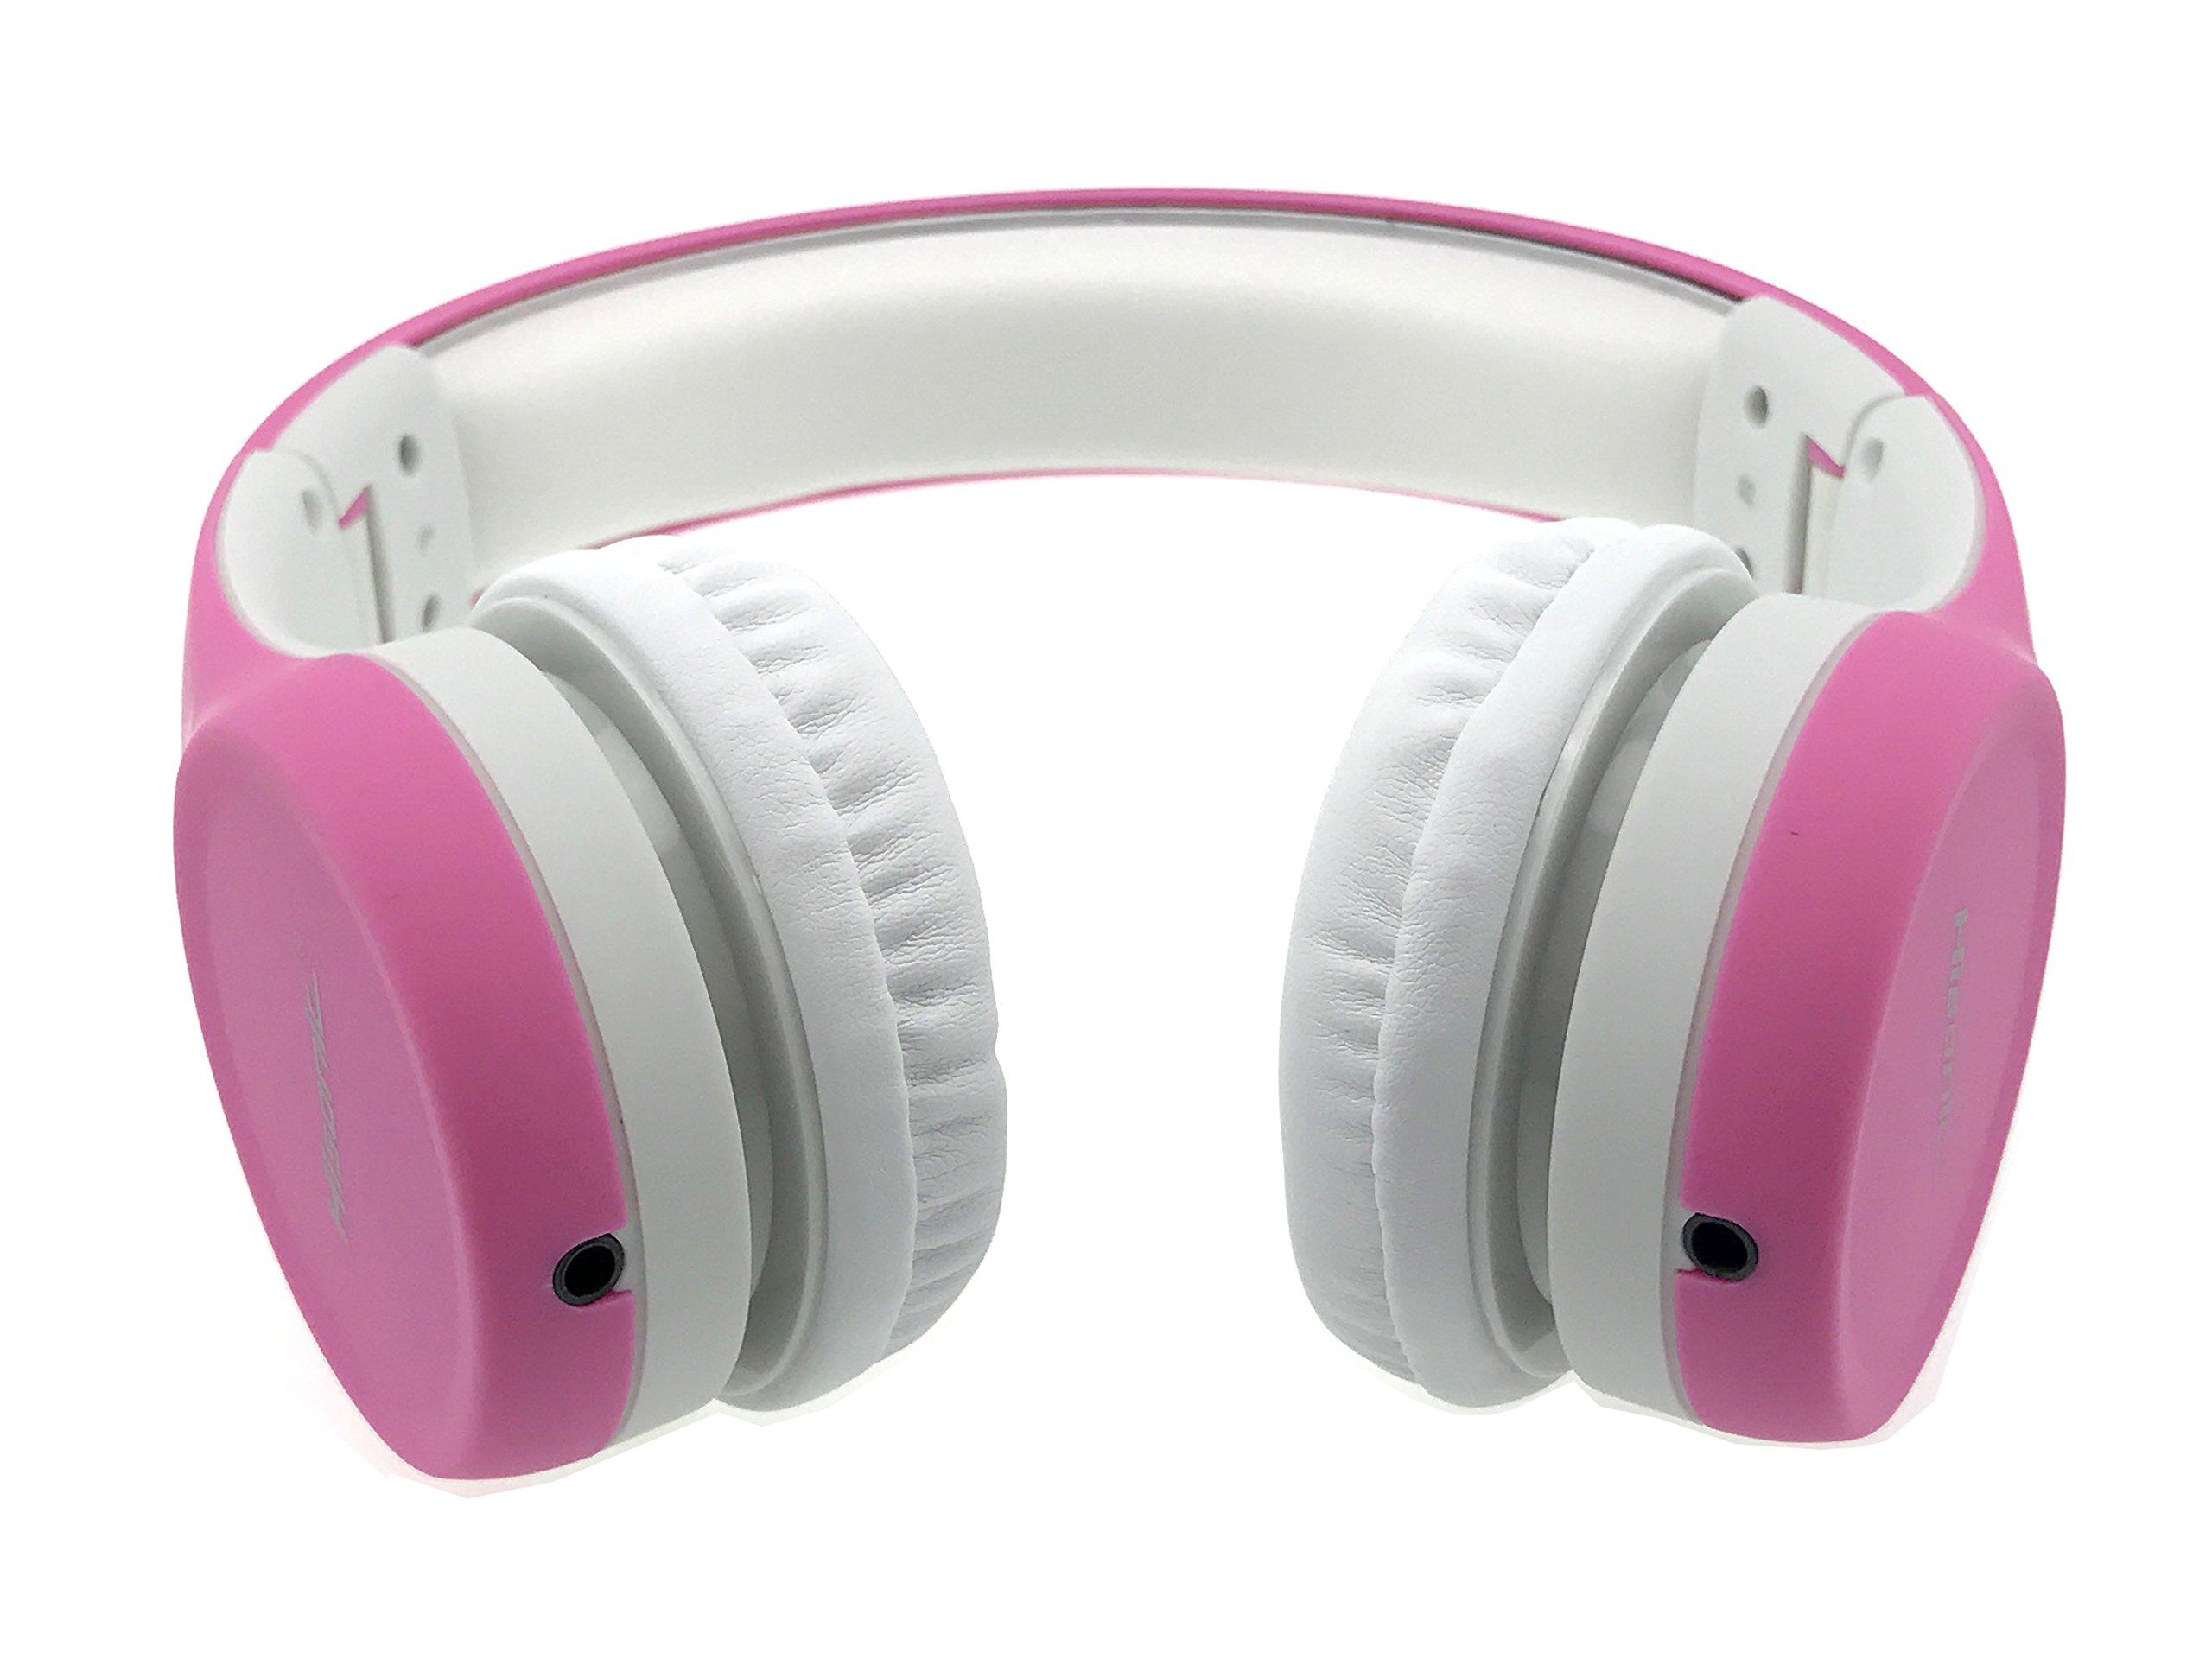 Hisonic Limited Volume Kids Foldable Headphones - Pink